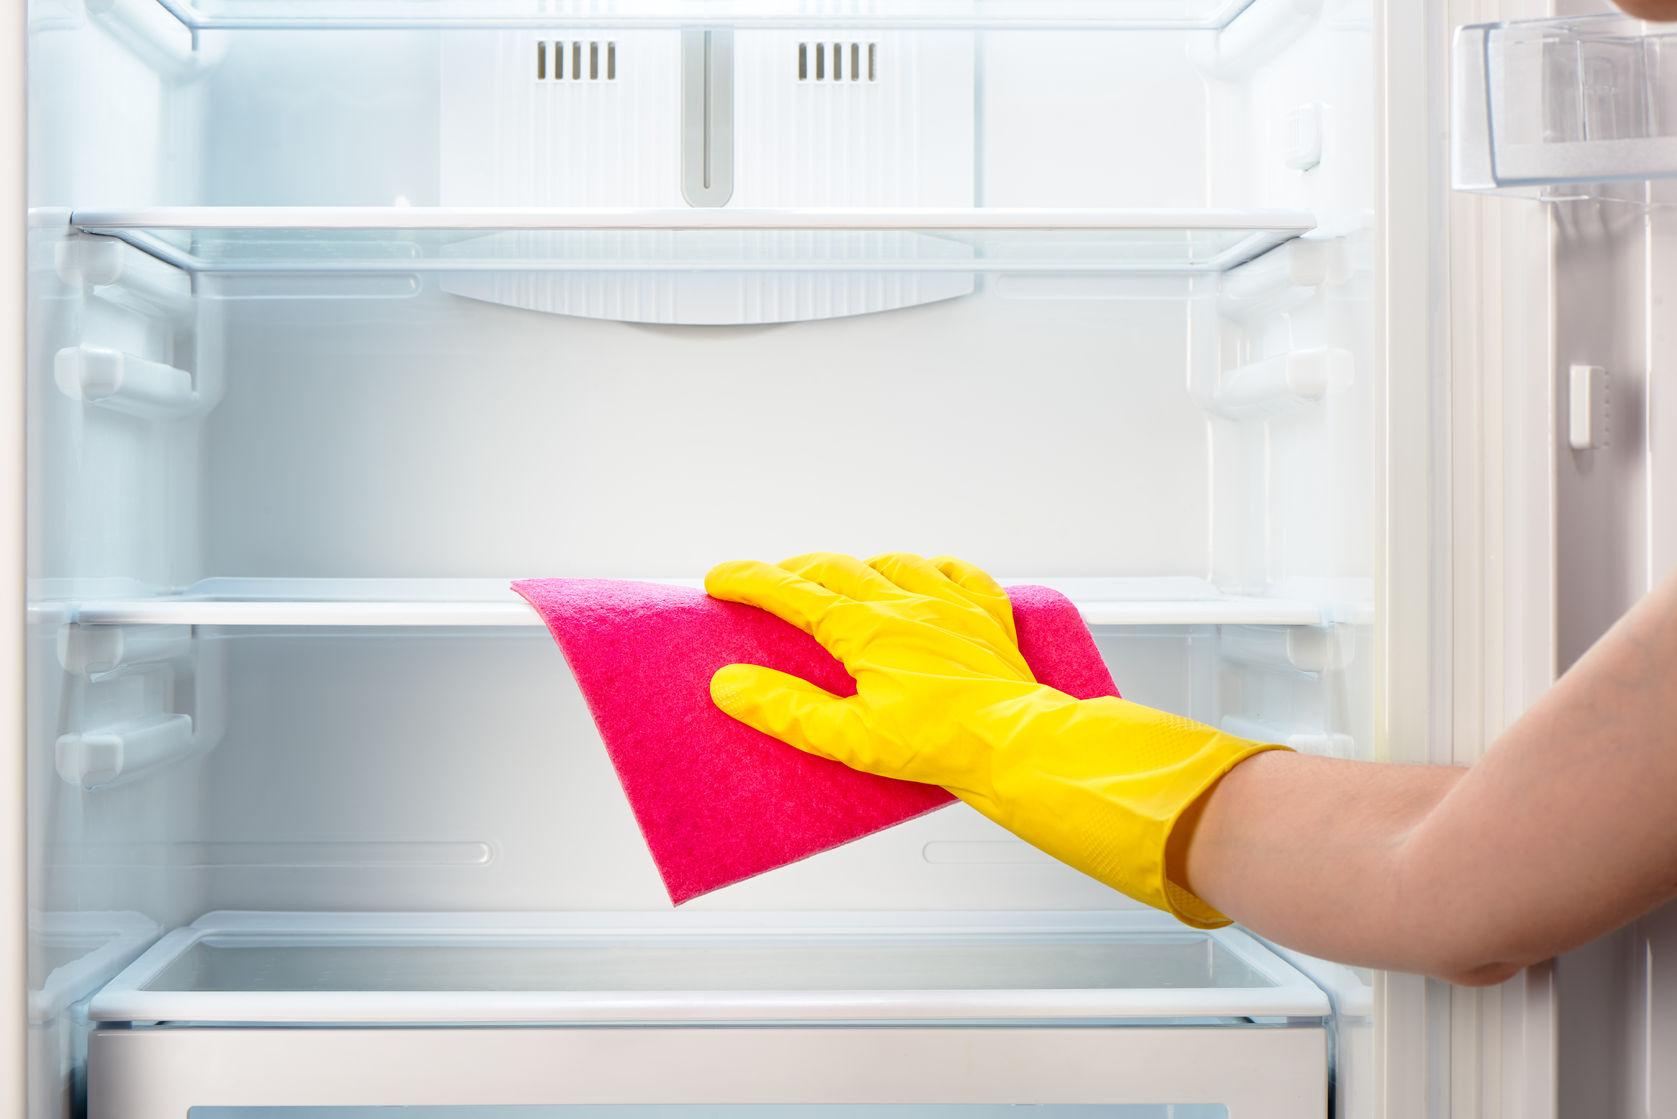 wipe down refrigerator